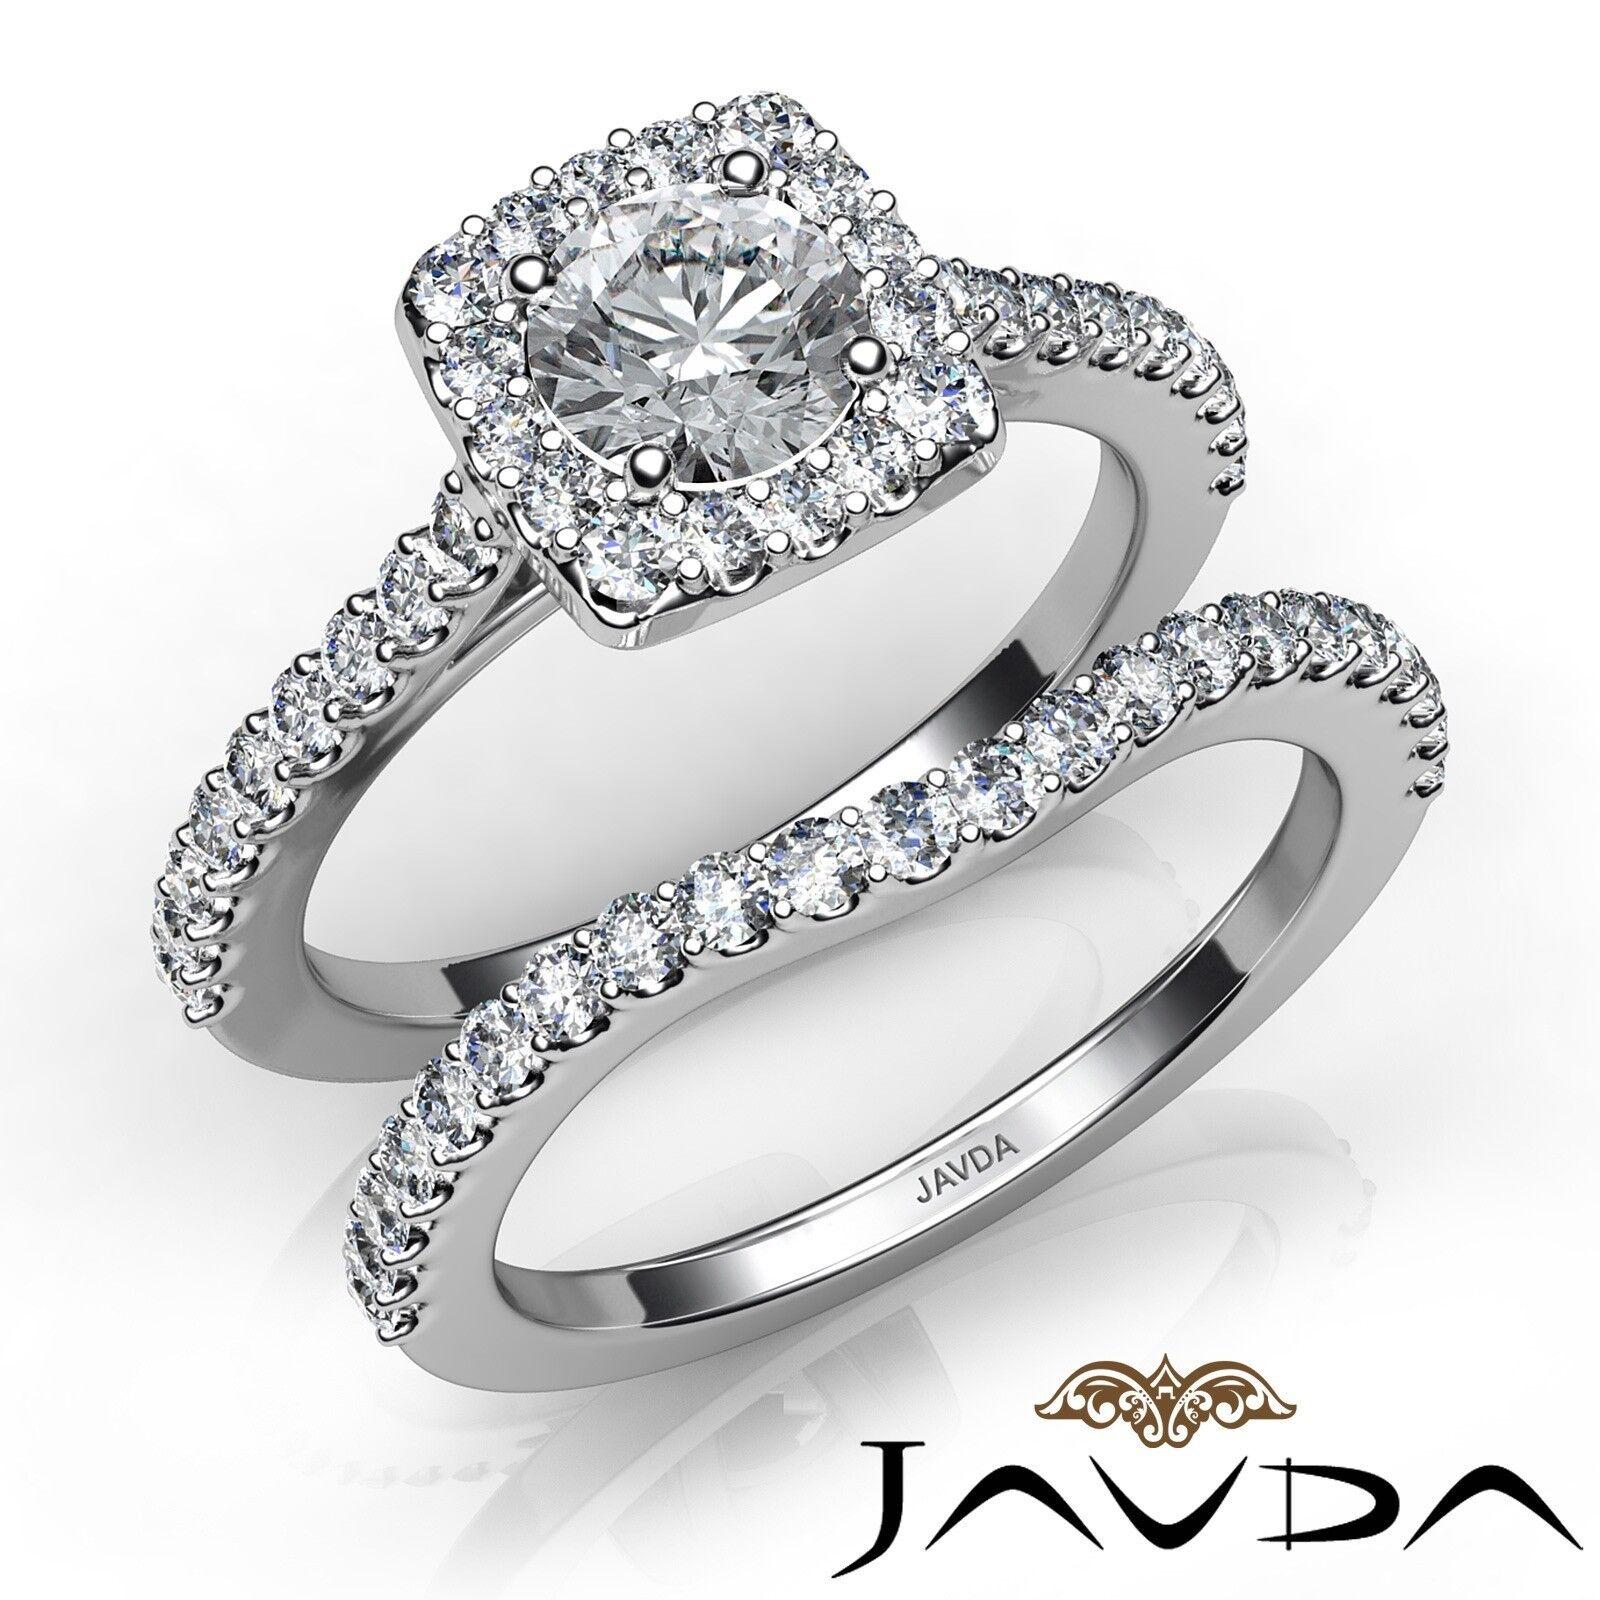 1.5ctw Halo U Prong Bridal Set Round Diamond Engagement Ring GIA H-VVS1 W Gold